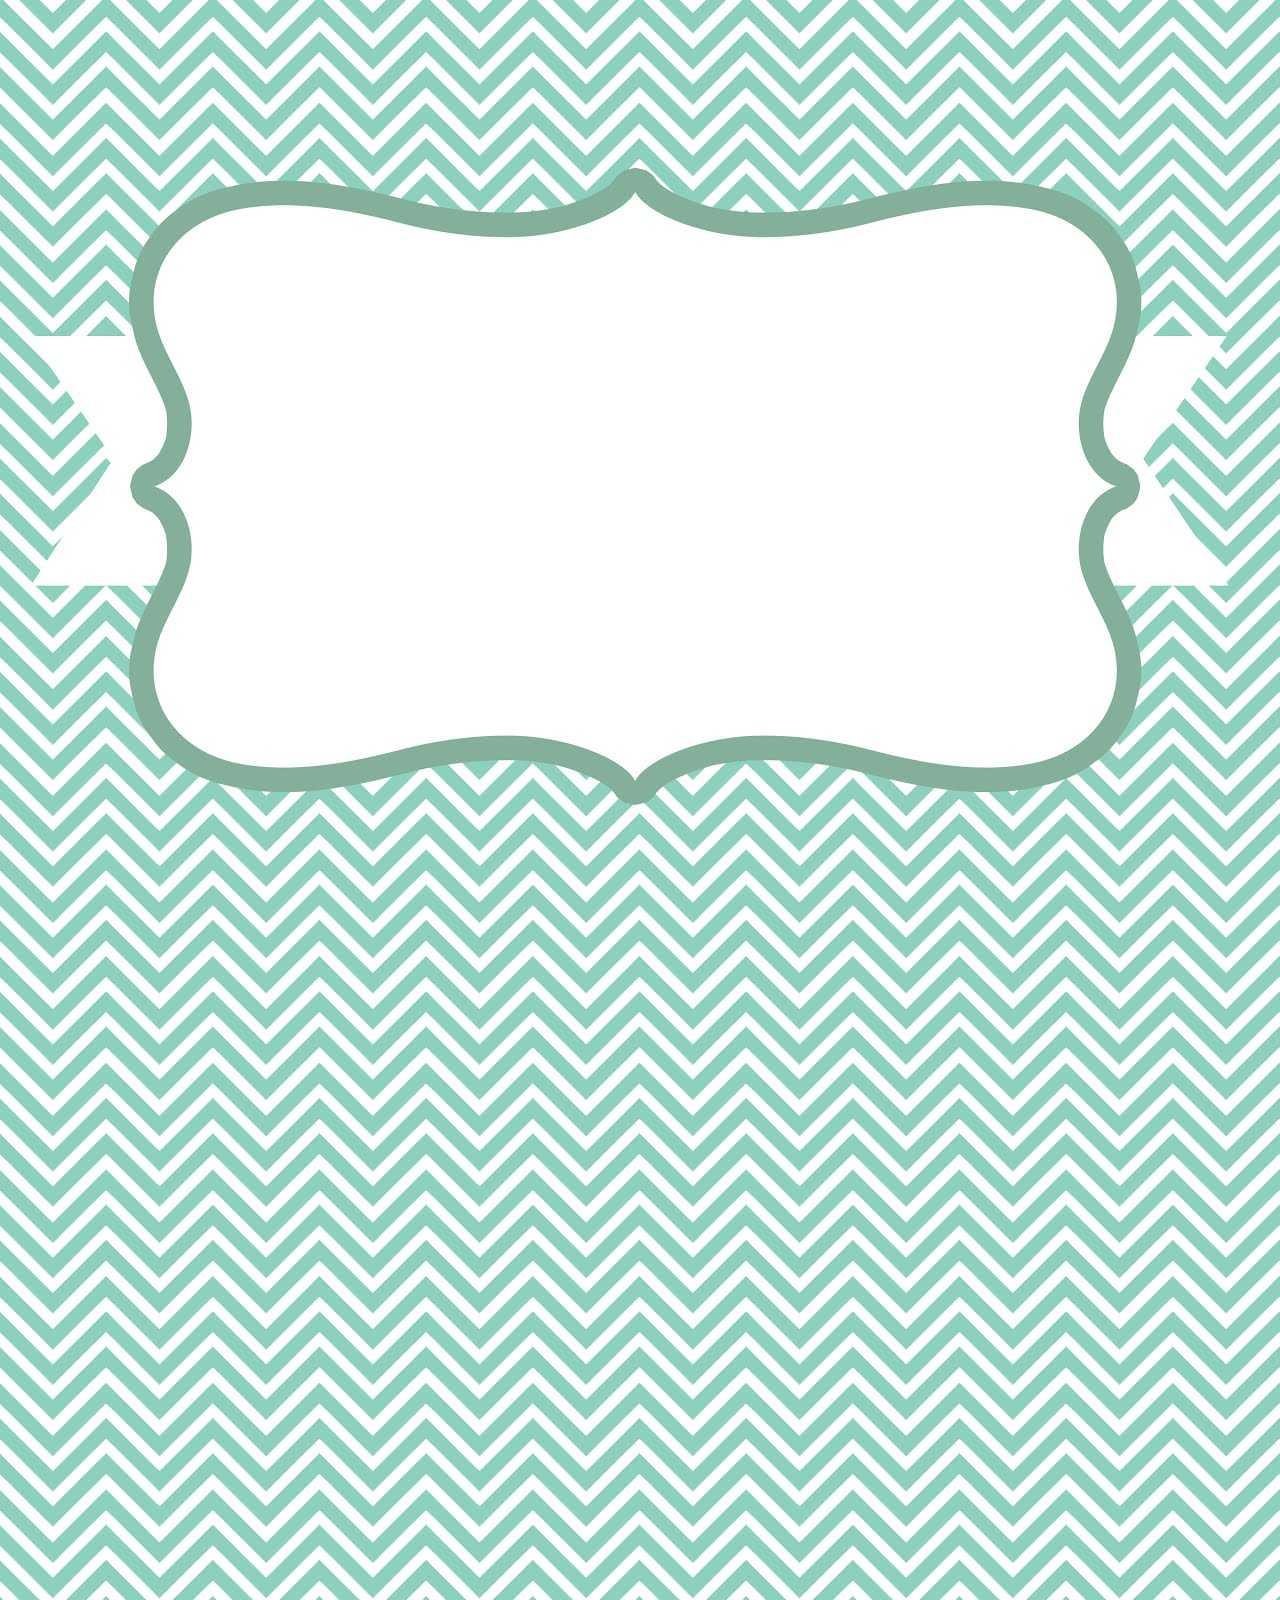 Floral Background Binder Cover Templates. Binder Cover Inside Free Printable Binder Cover Templates